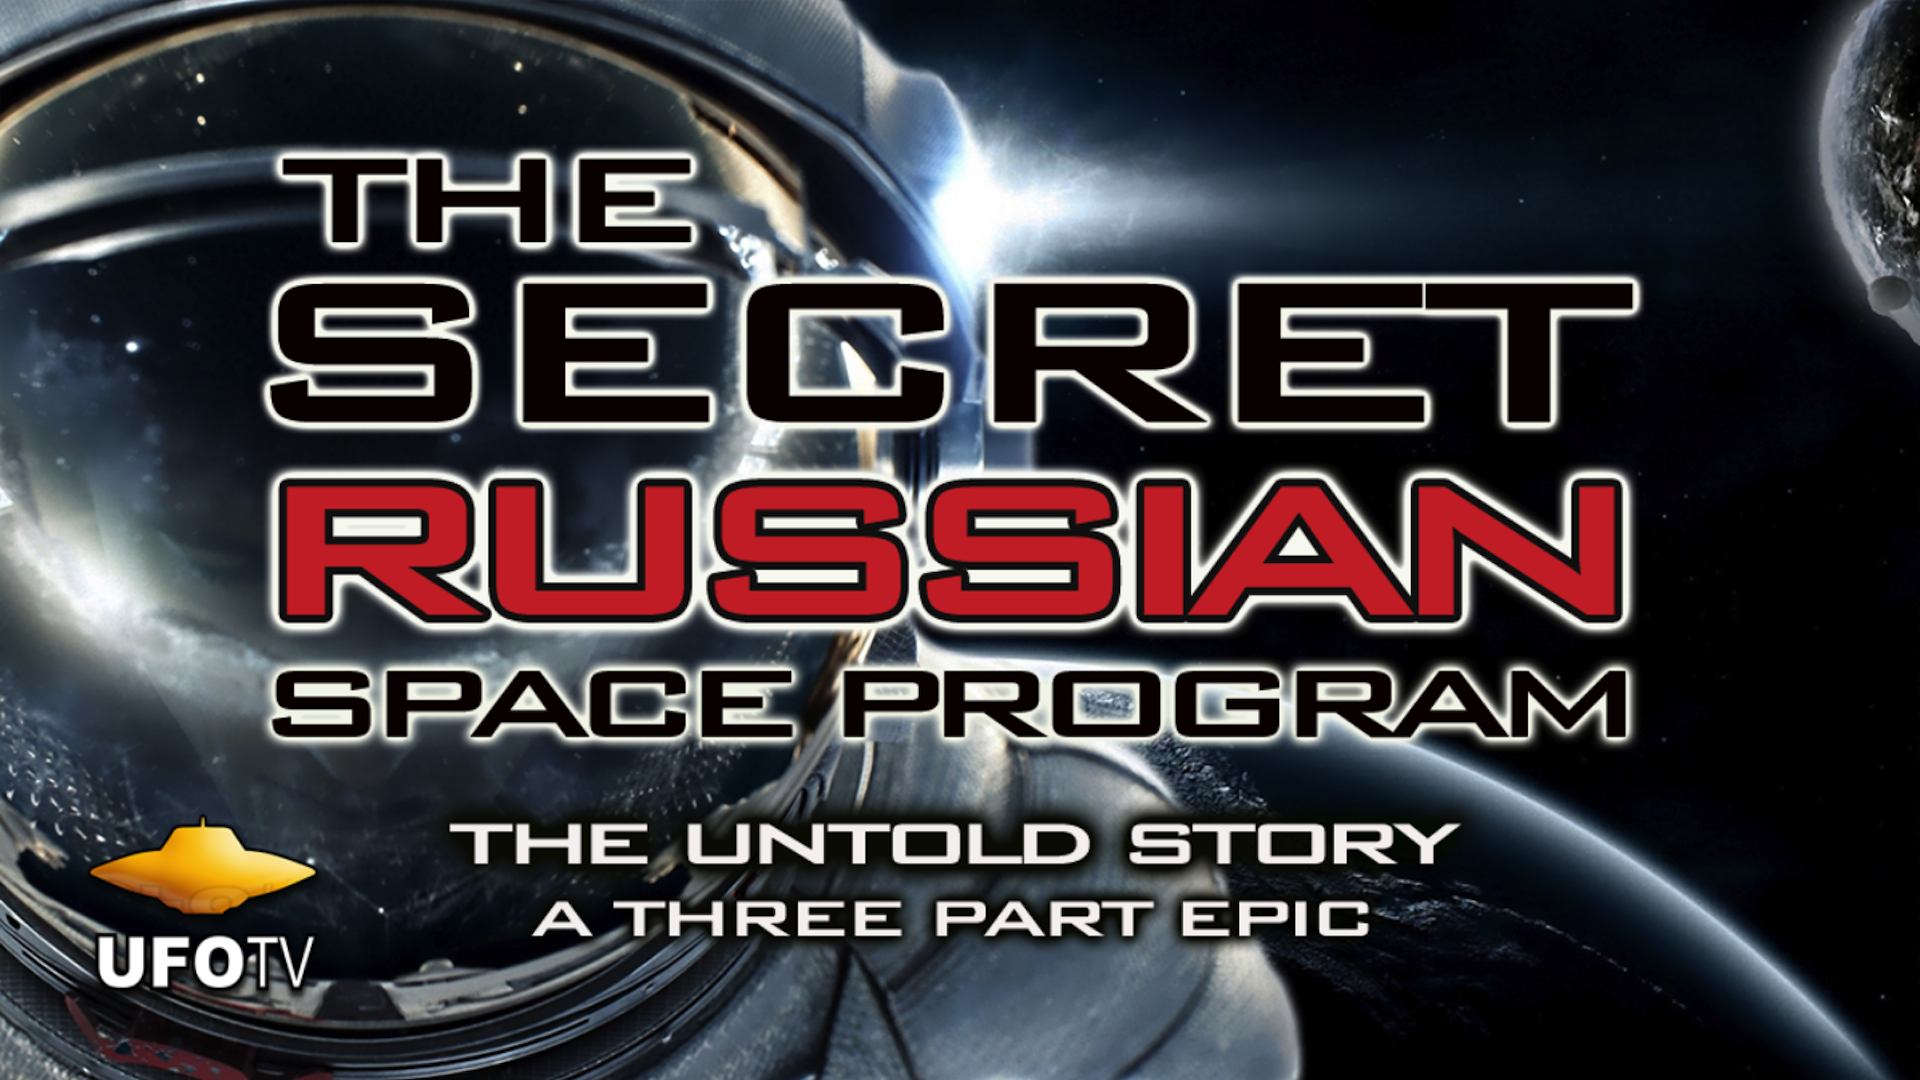 The Secret Russian Space Program - The Untold Story